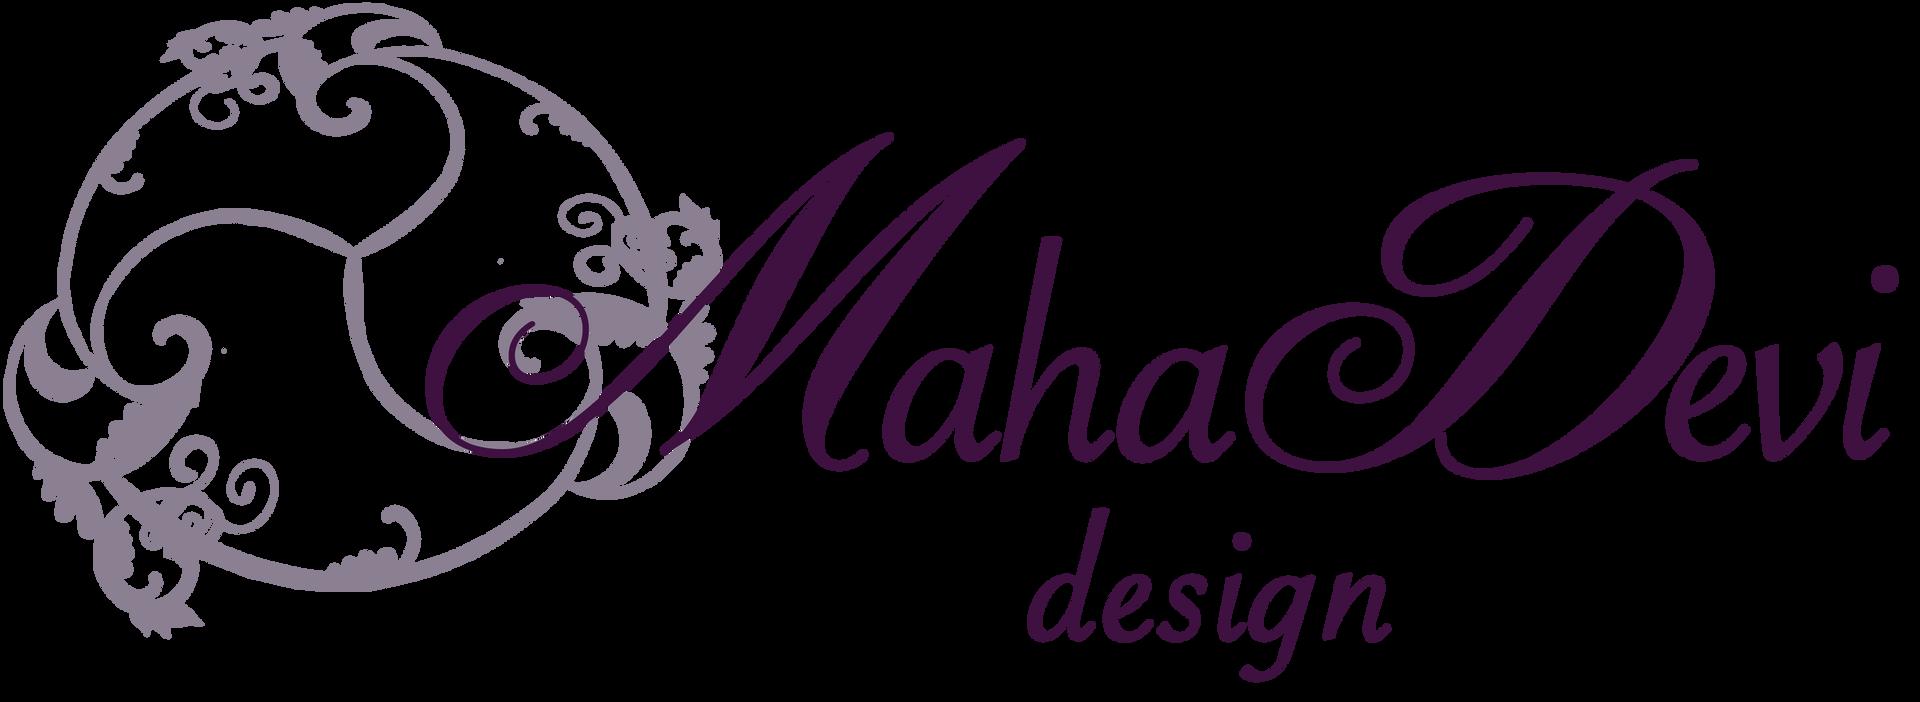 Maha Devi Design